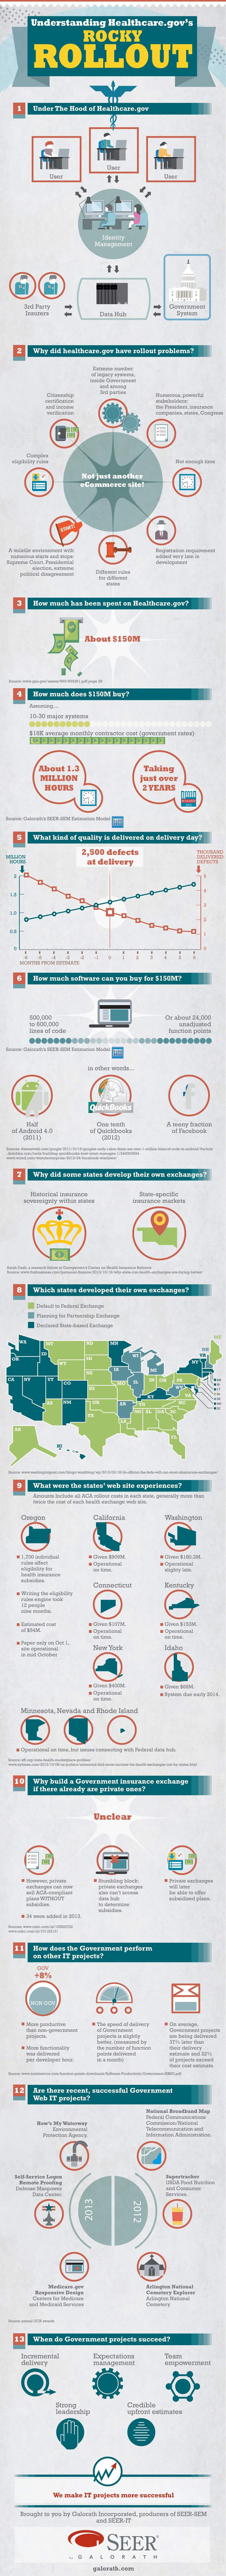 Understanding Healthcare.gov's Rocky Rollout